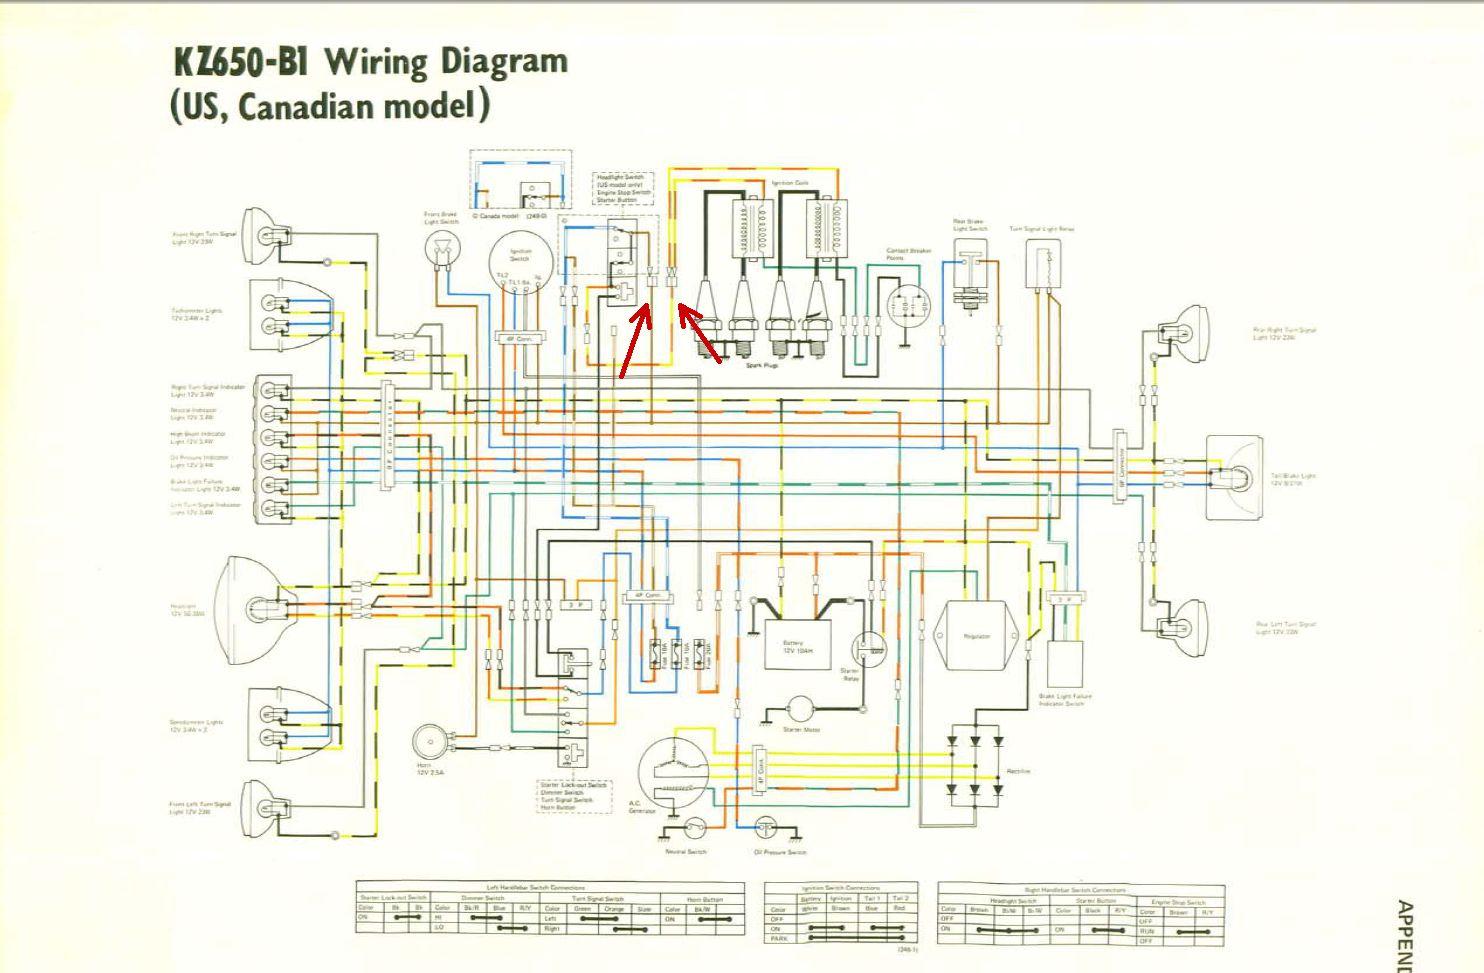 [DIAGRAM_34OR]  1981 Kz650 Wiring Diagram Spdt Switch Wiring Diagram Fan -  komeng.23.allianceconseil59.fr | Kz650 Wiring Diagram |  | komeng.23.allianceconseil59.fr